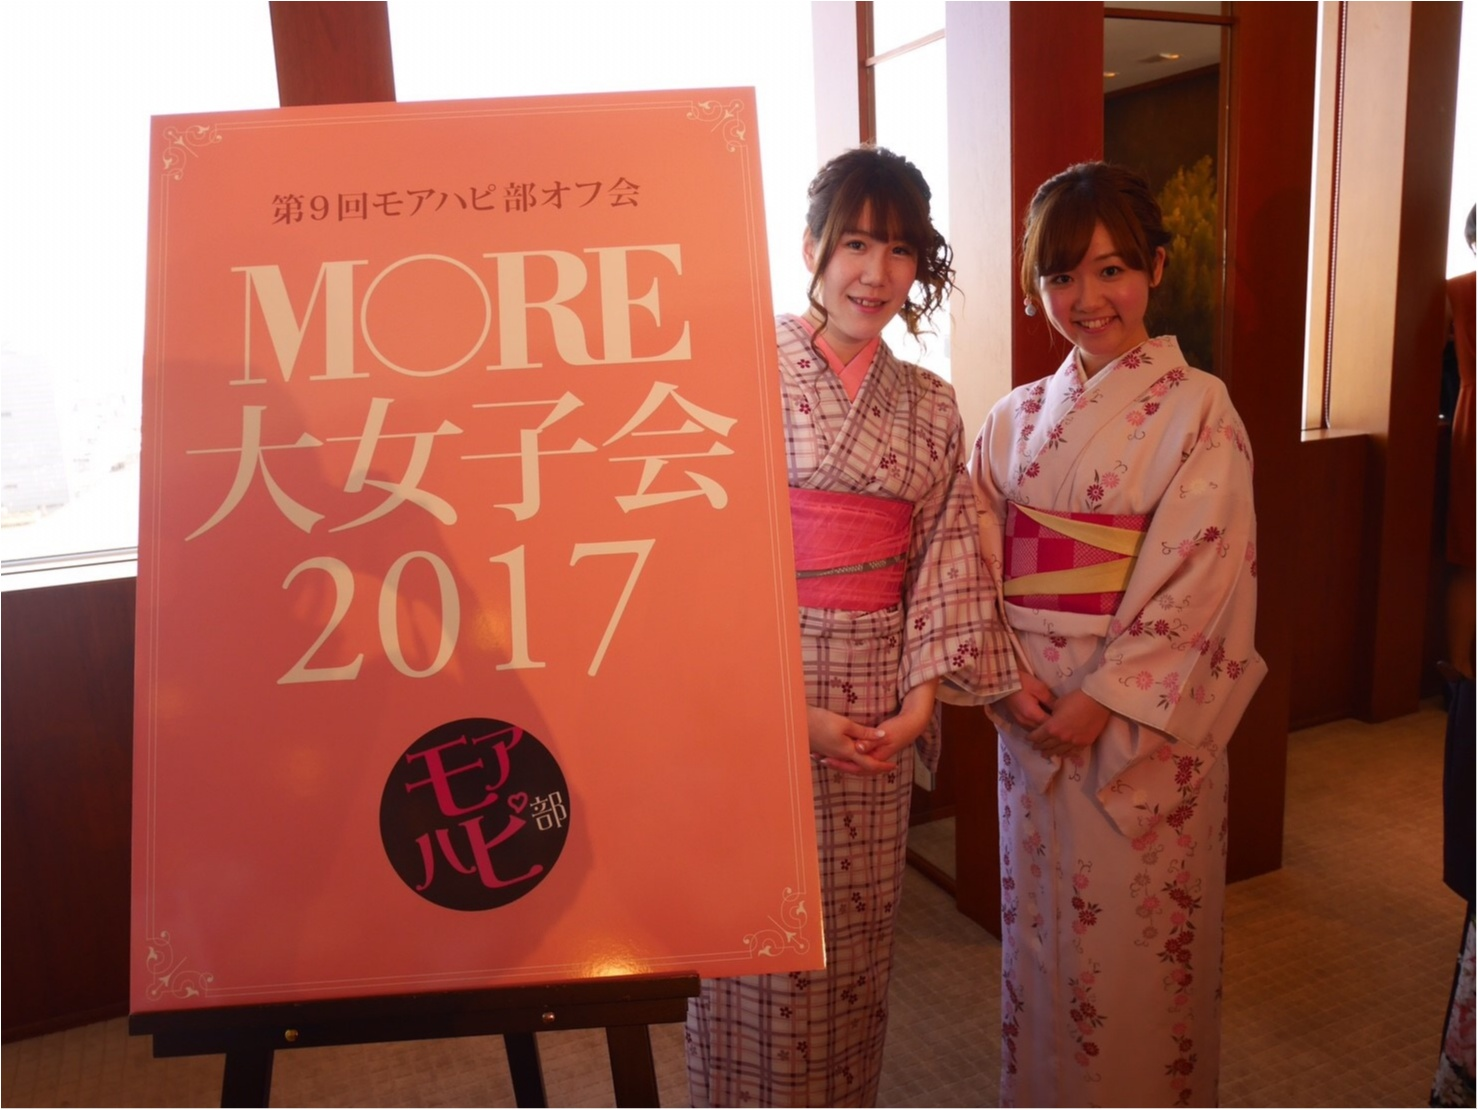 【MORE大女子会2017】今年はお着物で参加です♡_2